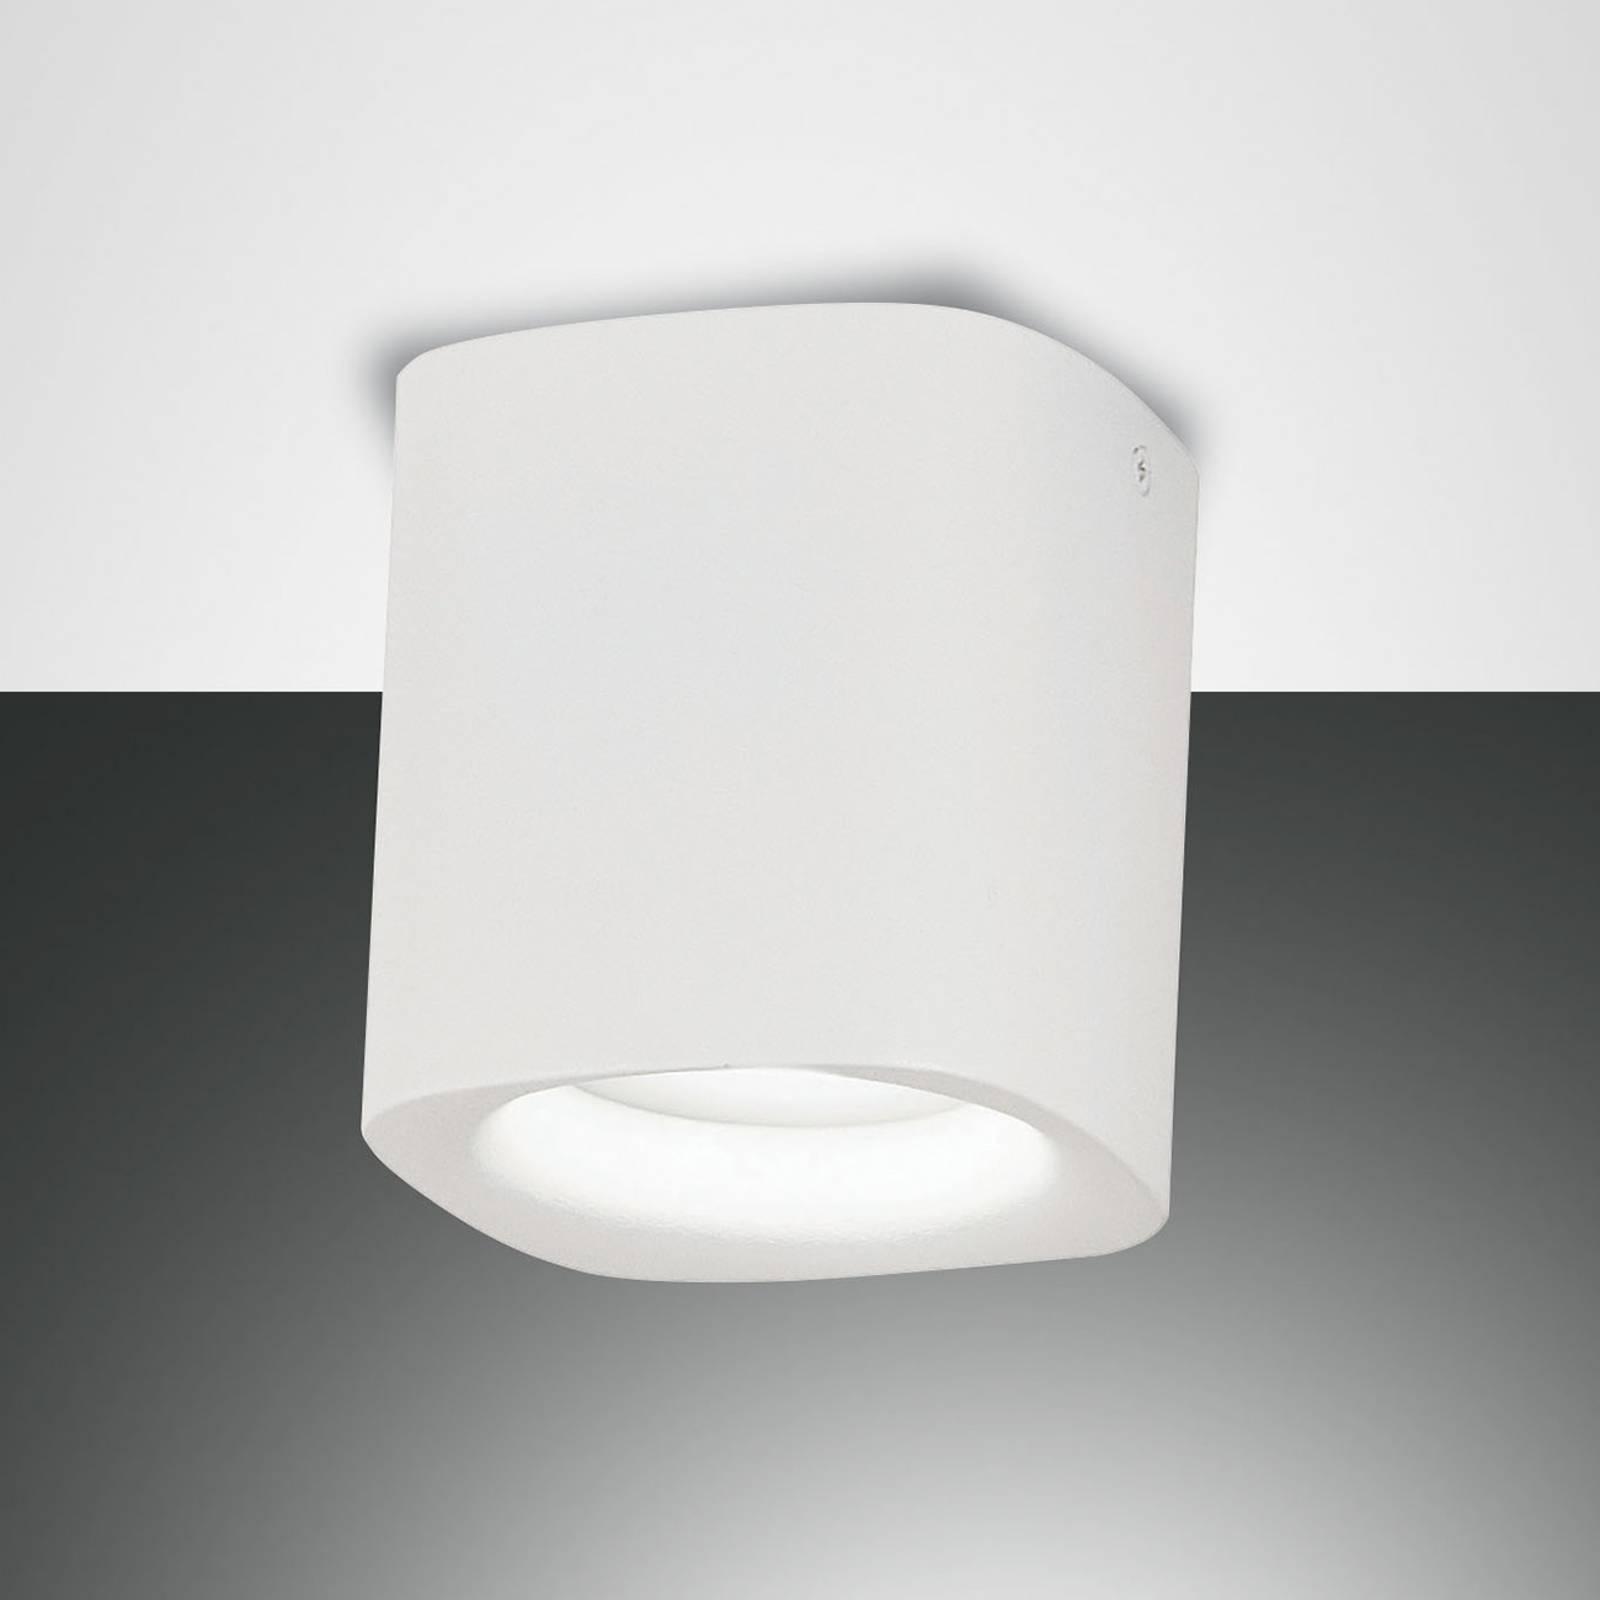 Plafondlamp Smooth, 1-lamp, wit, IP44